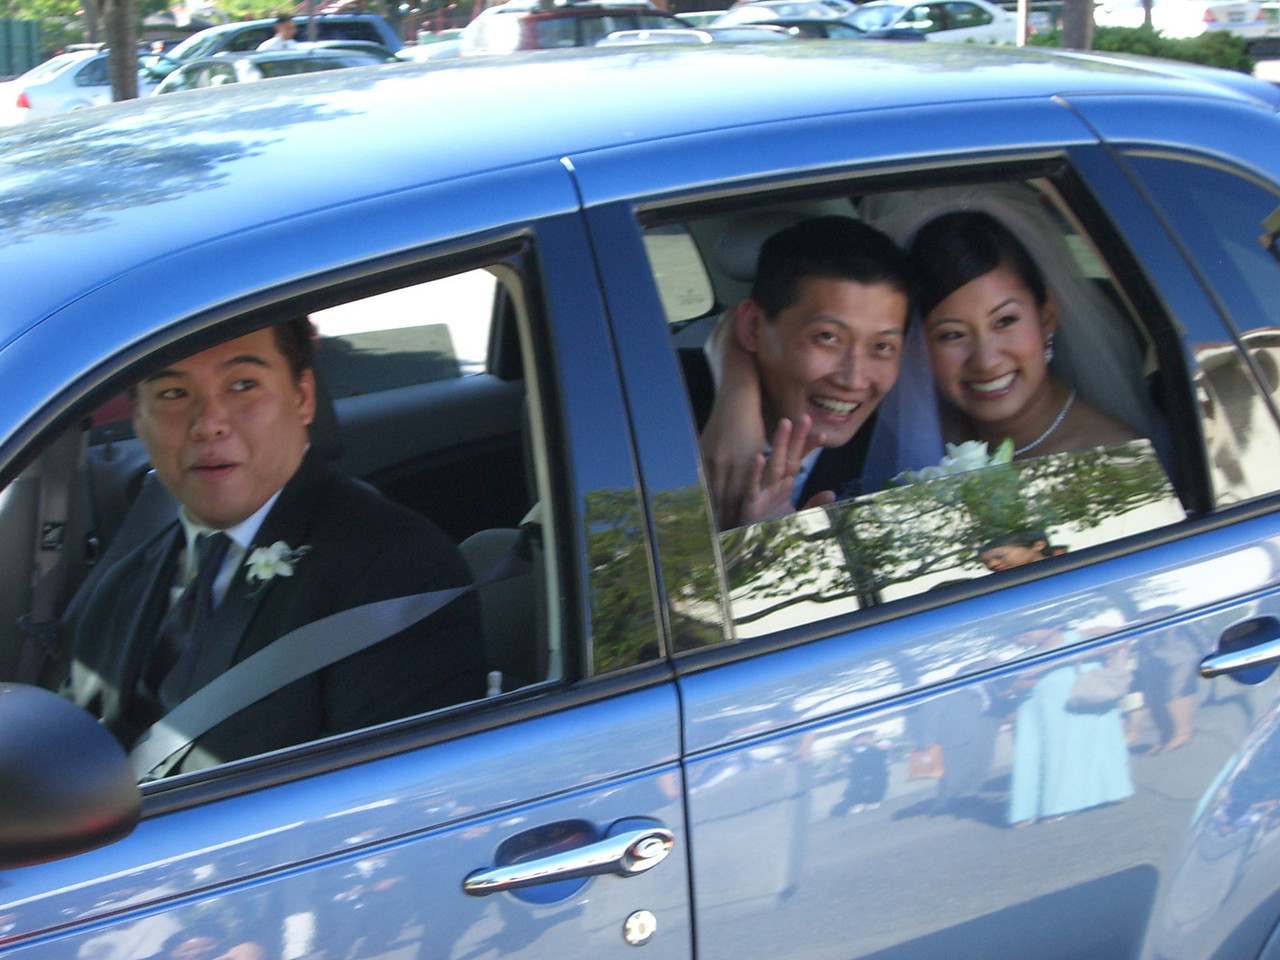 2006 06 18 Sun - Chauffeur Lawrence Joe, Mike & Brittany Chen